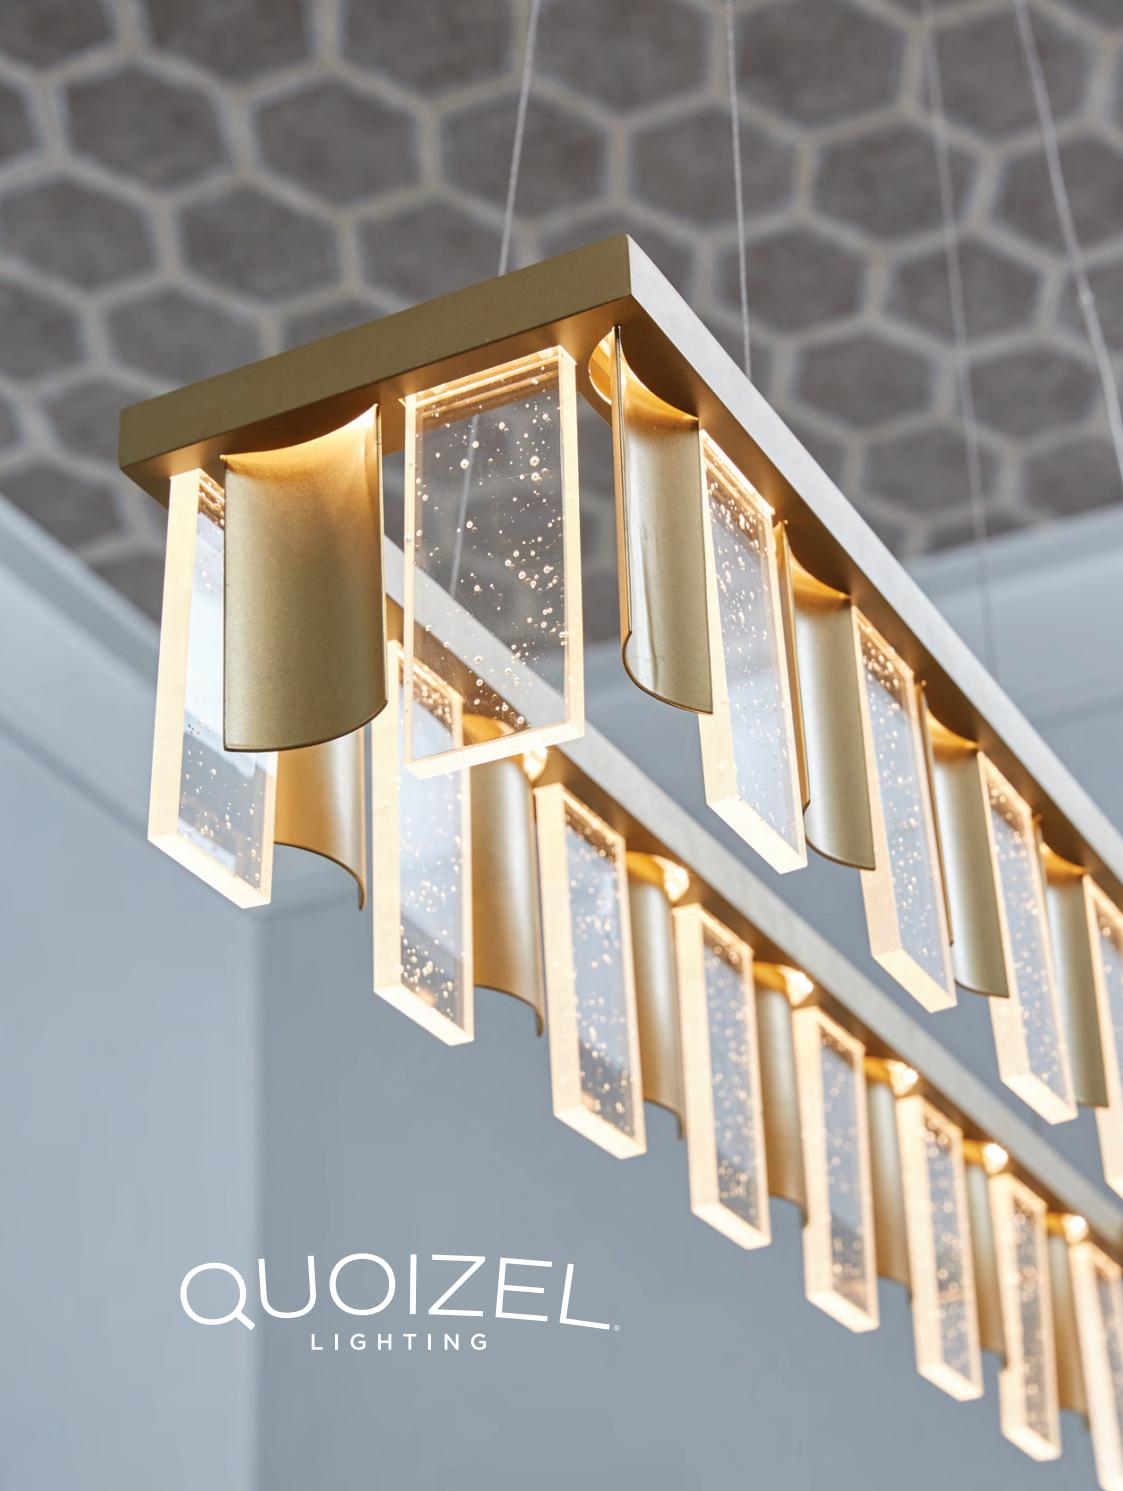 QF3631PN Quoizel 3 Light Fixture Semi-Flush Mount Palladian Bronze